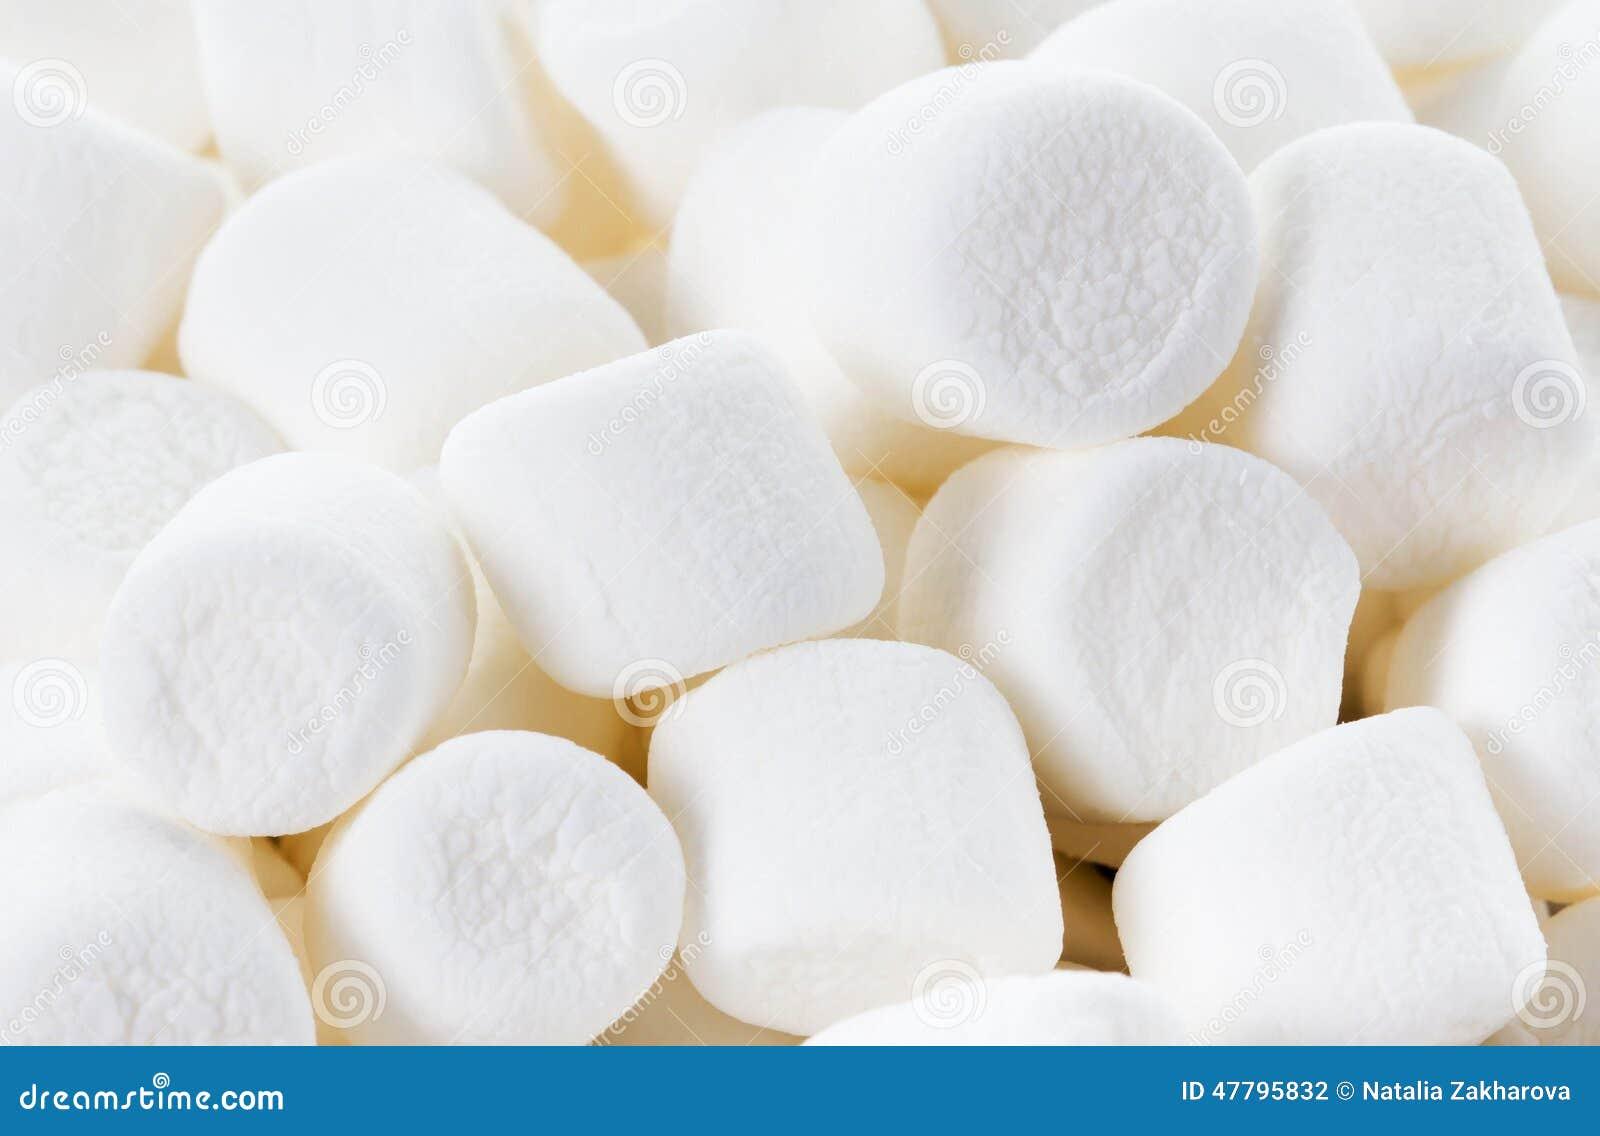 white fluffy round marshmallows as a background sweet food ca stockwhite fluffy round marshmallows as a background sweet food candy background as poster wallpaper, backdrop macro